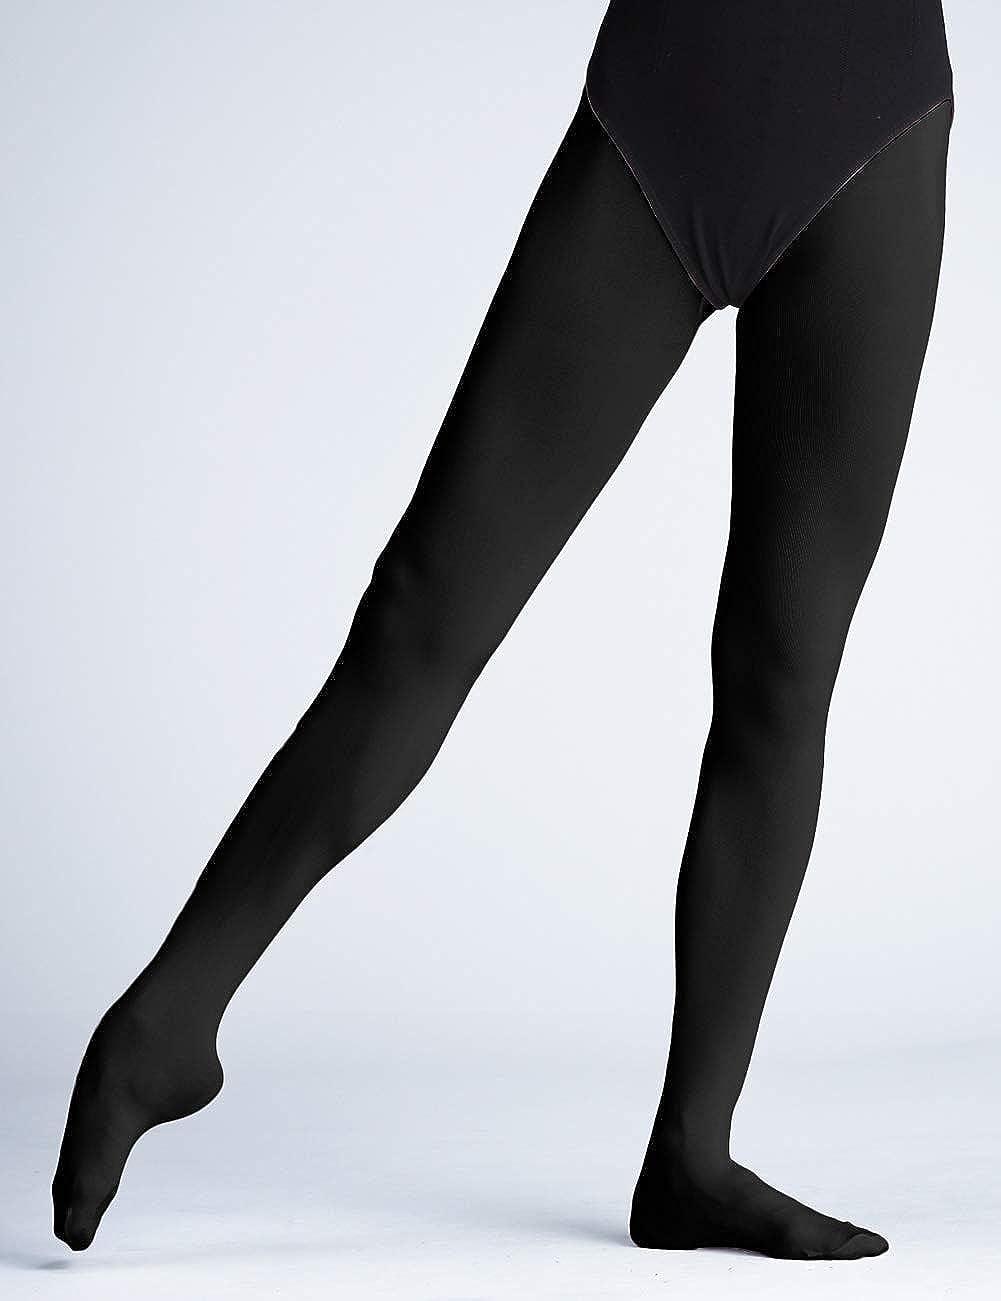 Mistral Ivory Bridal//dance// ballet 30 Denier tights.pk of 2 Free p+p